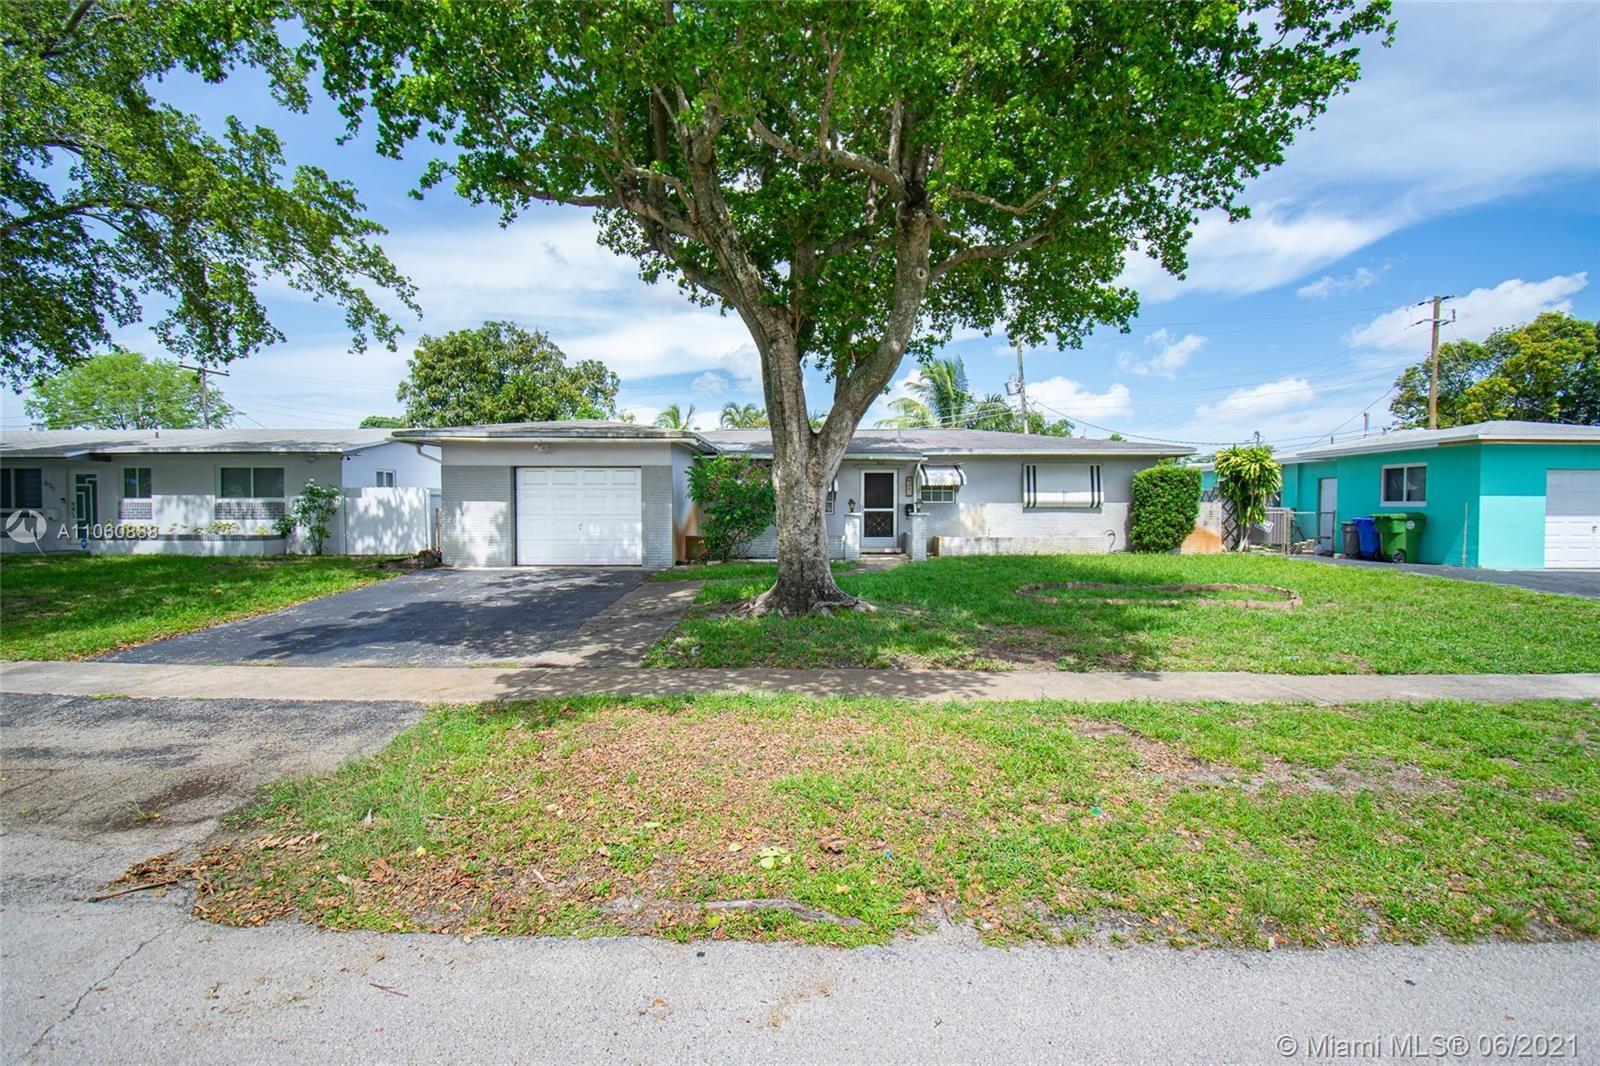 621 NW 78th Ave, Pembroke Pines, FL 33024 - #: A11060888